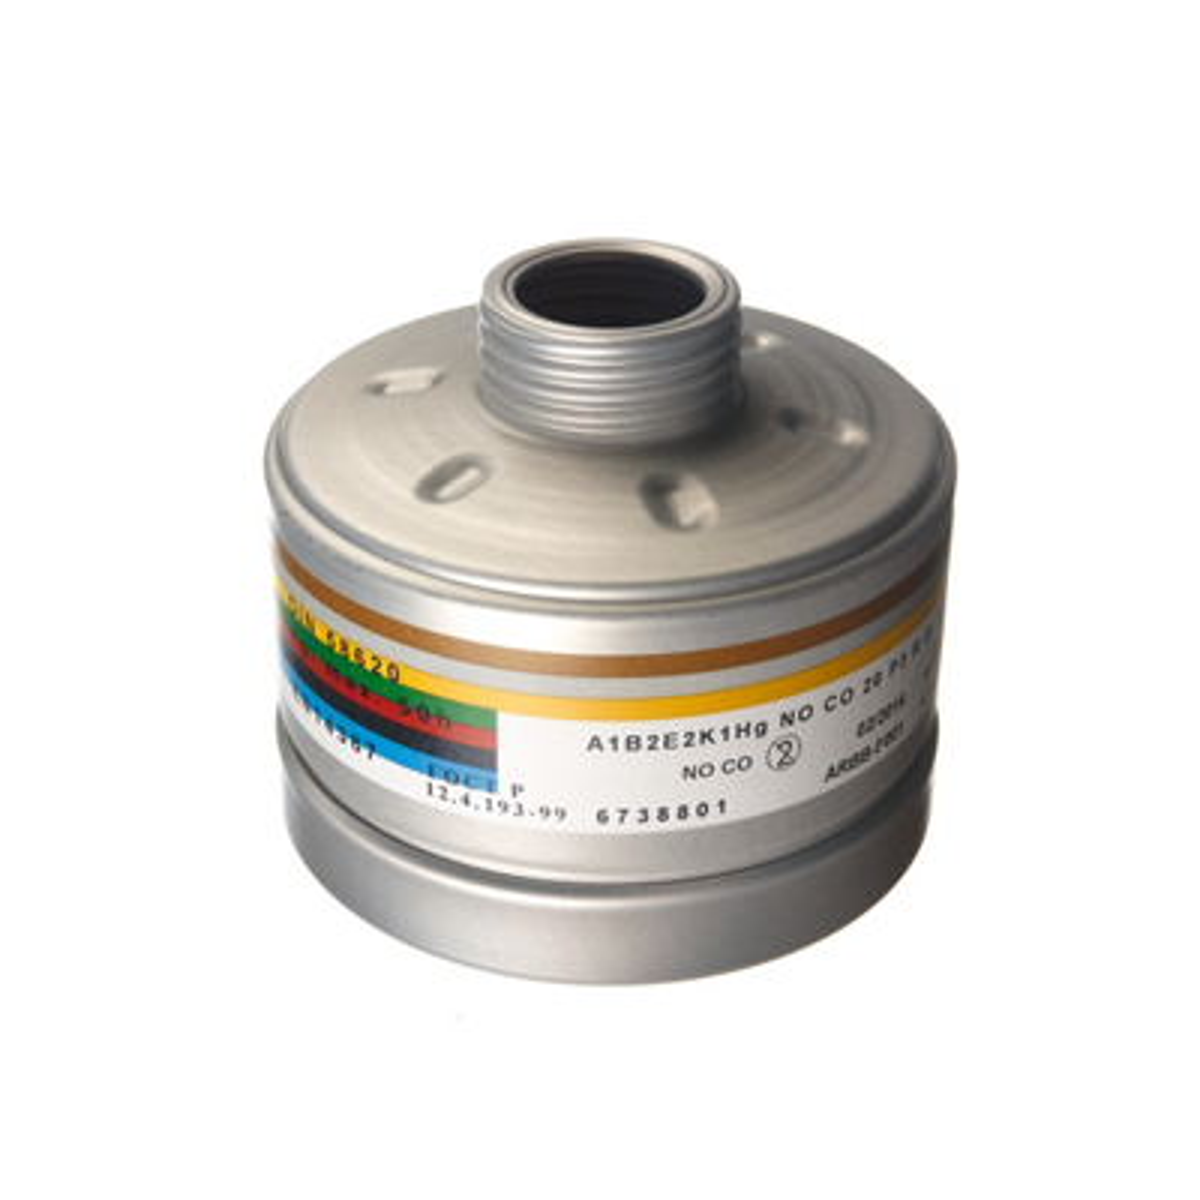 Filtre X-plore® RD40 - A1B2E2K1 HG CO20 NO P3 Dräger